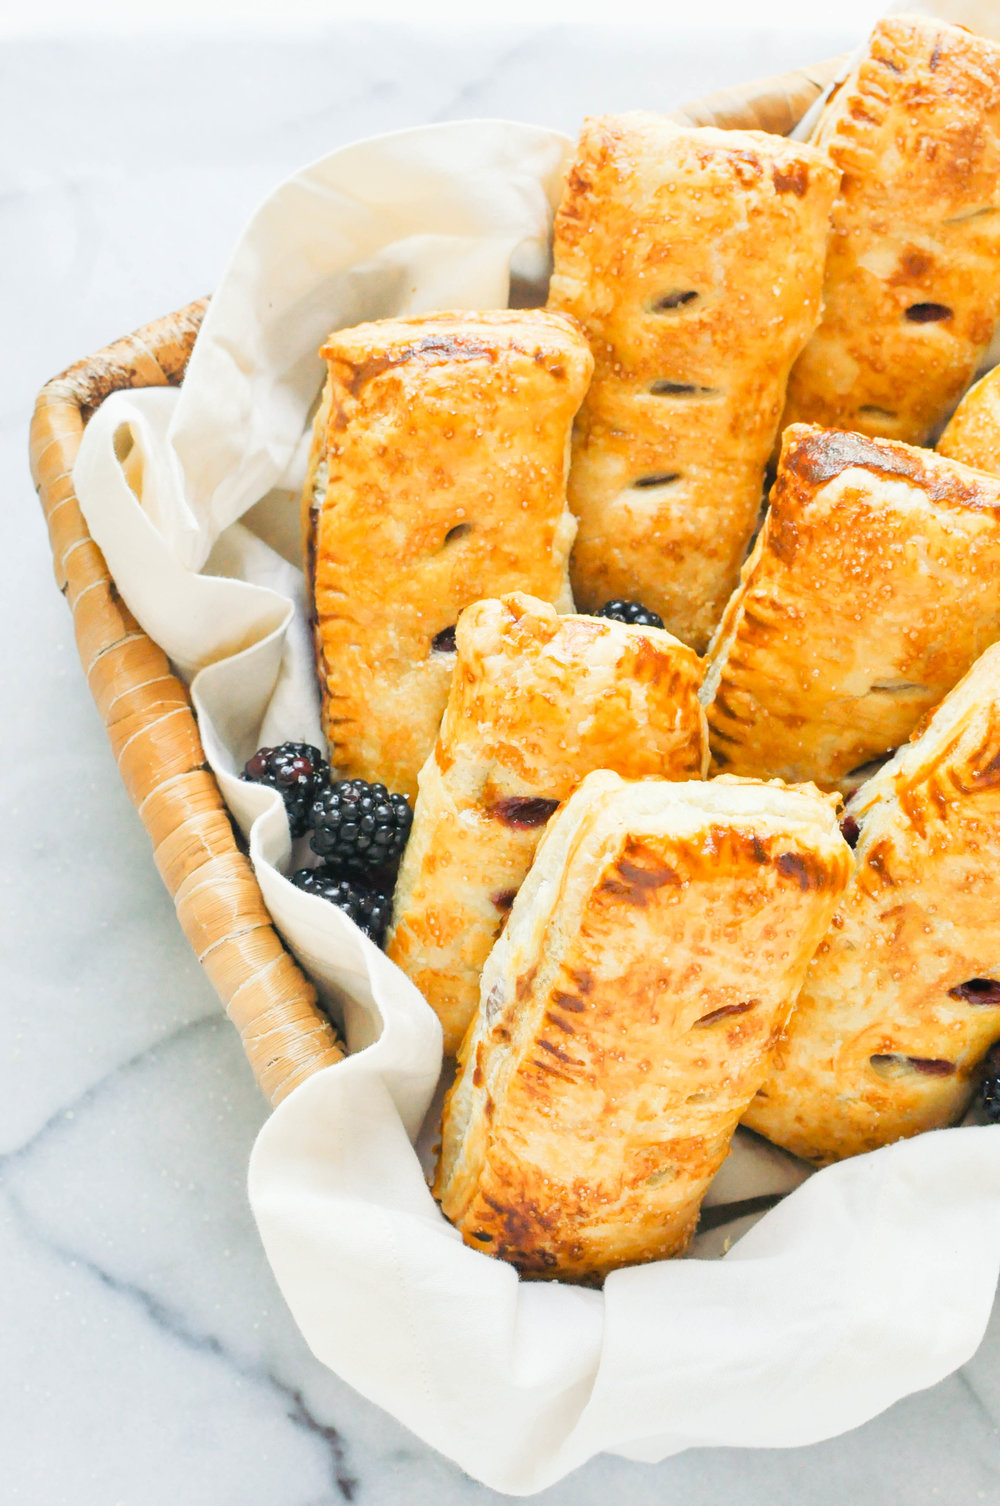 Blackberry & Apple Hand Pies (vegetarian, baking, fruit pie) | This Healthy Table